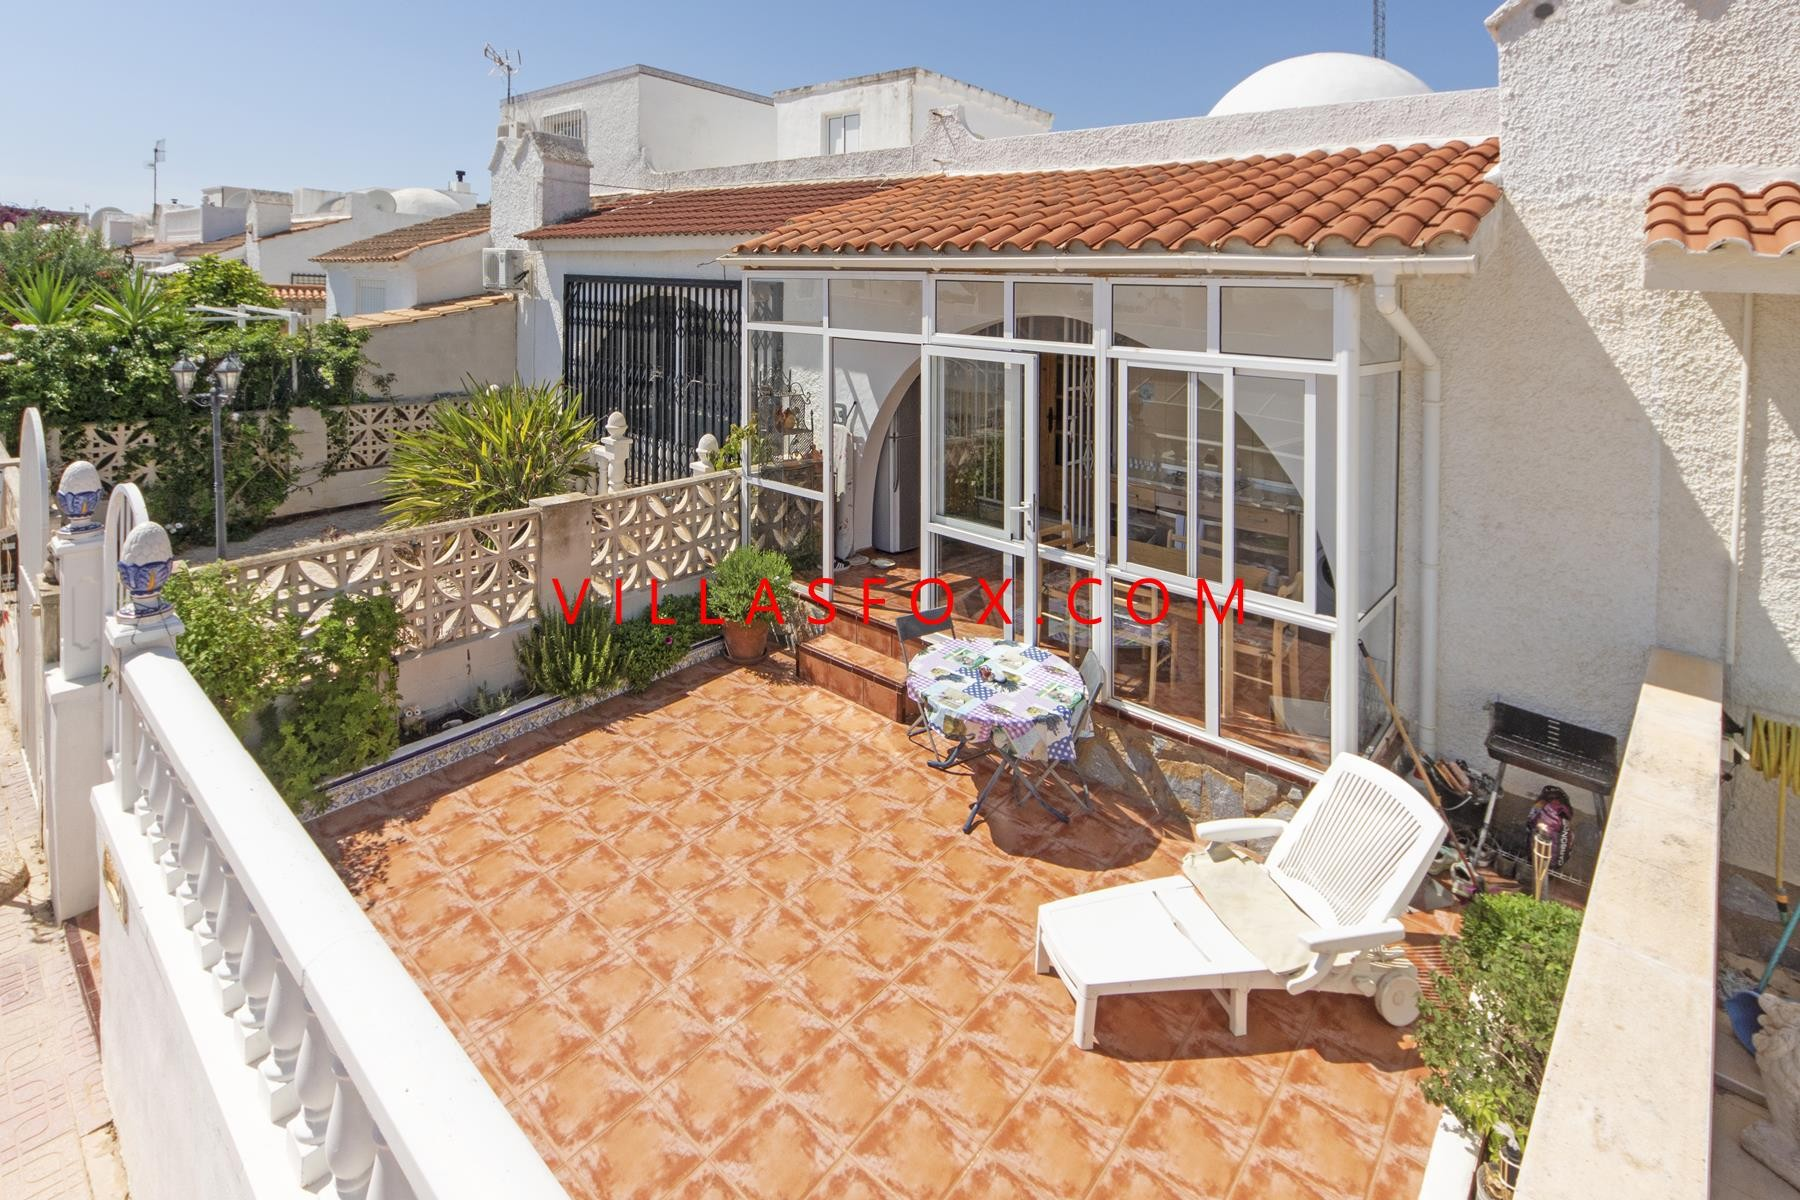 Blue Lagoon house for sale, San Miguel de Salinas (garden, solarium and great views!)